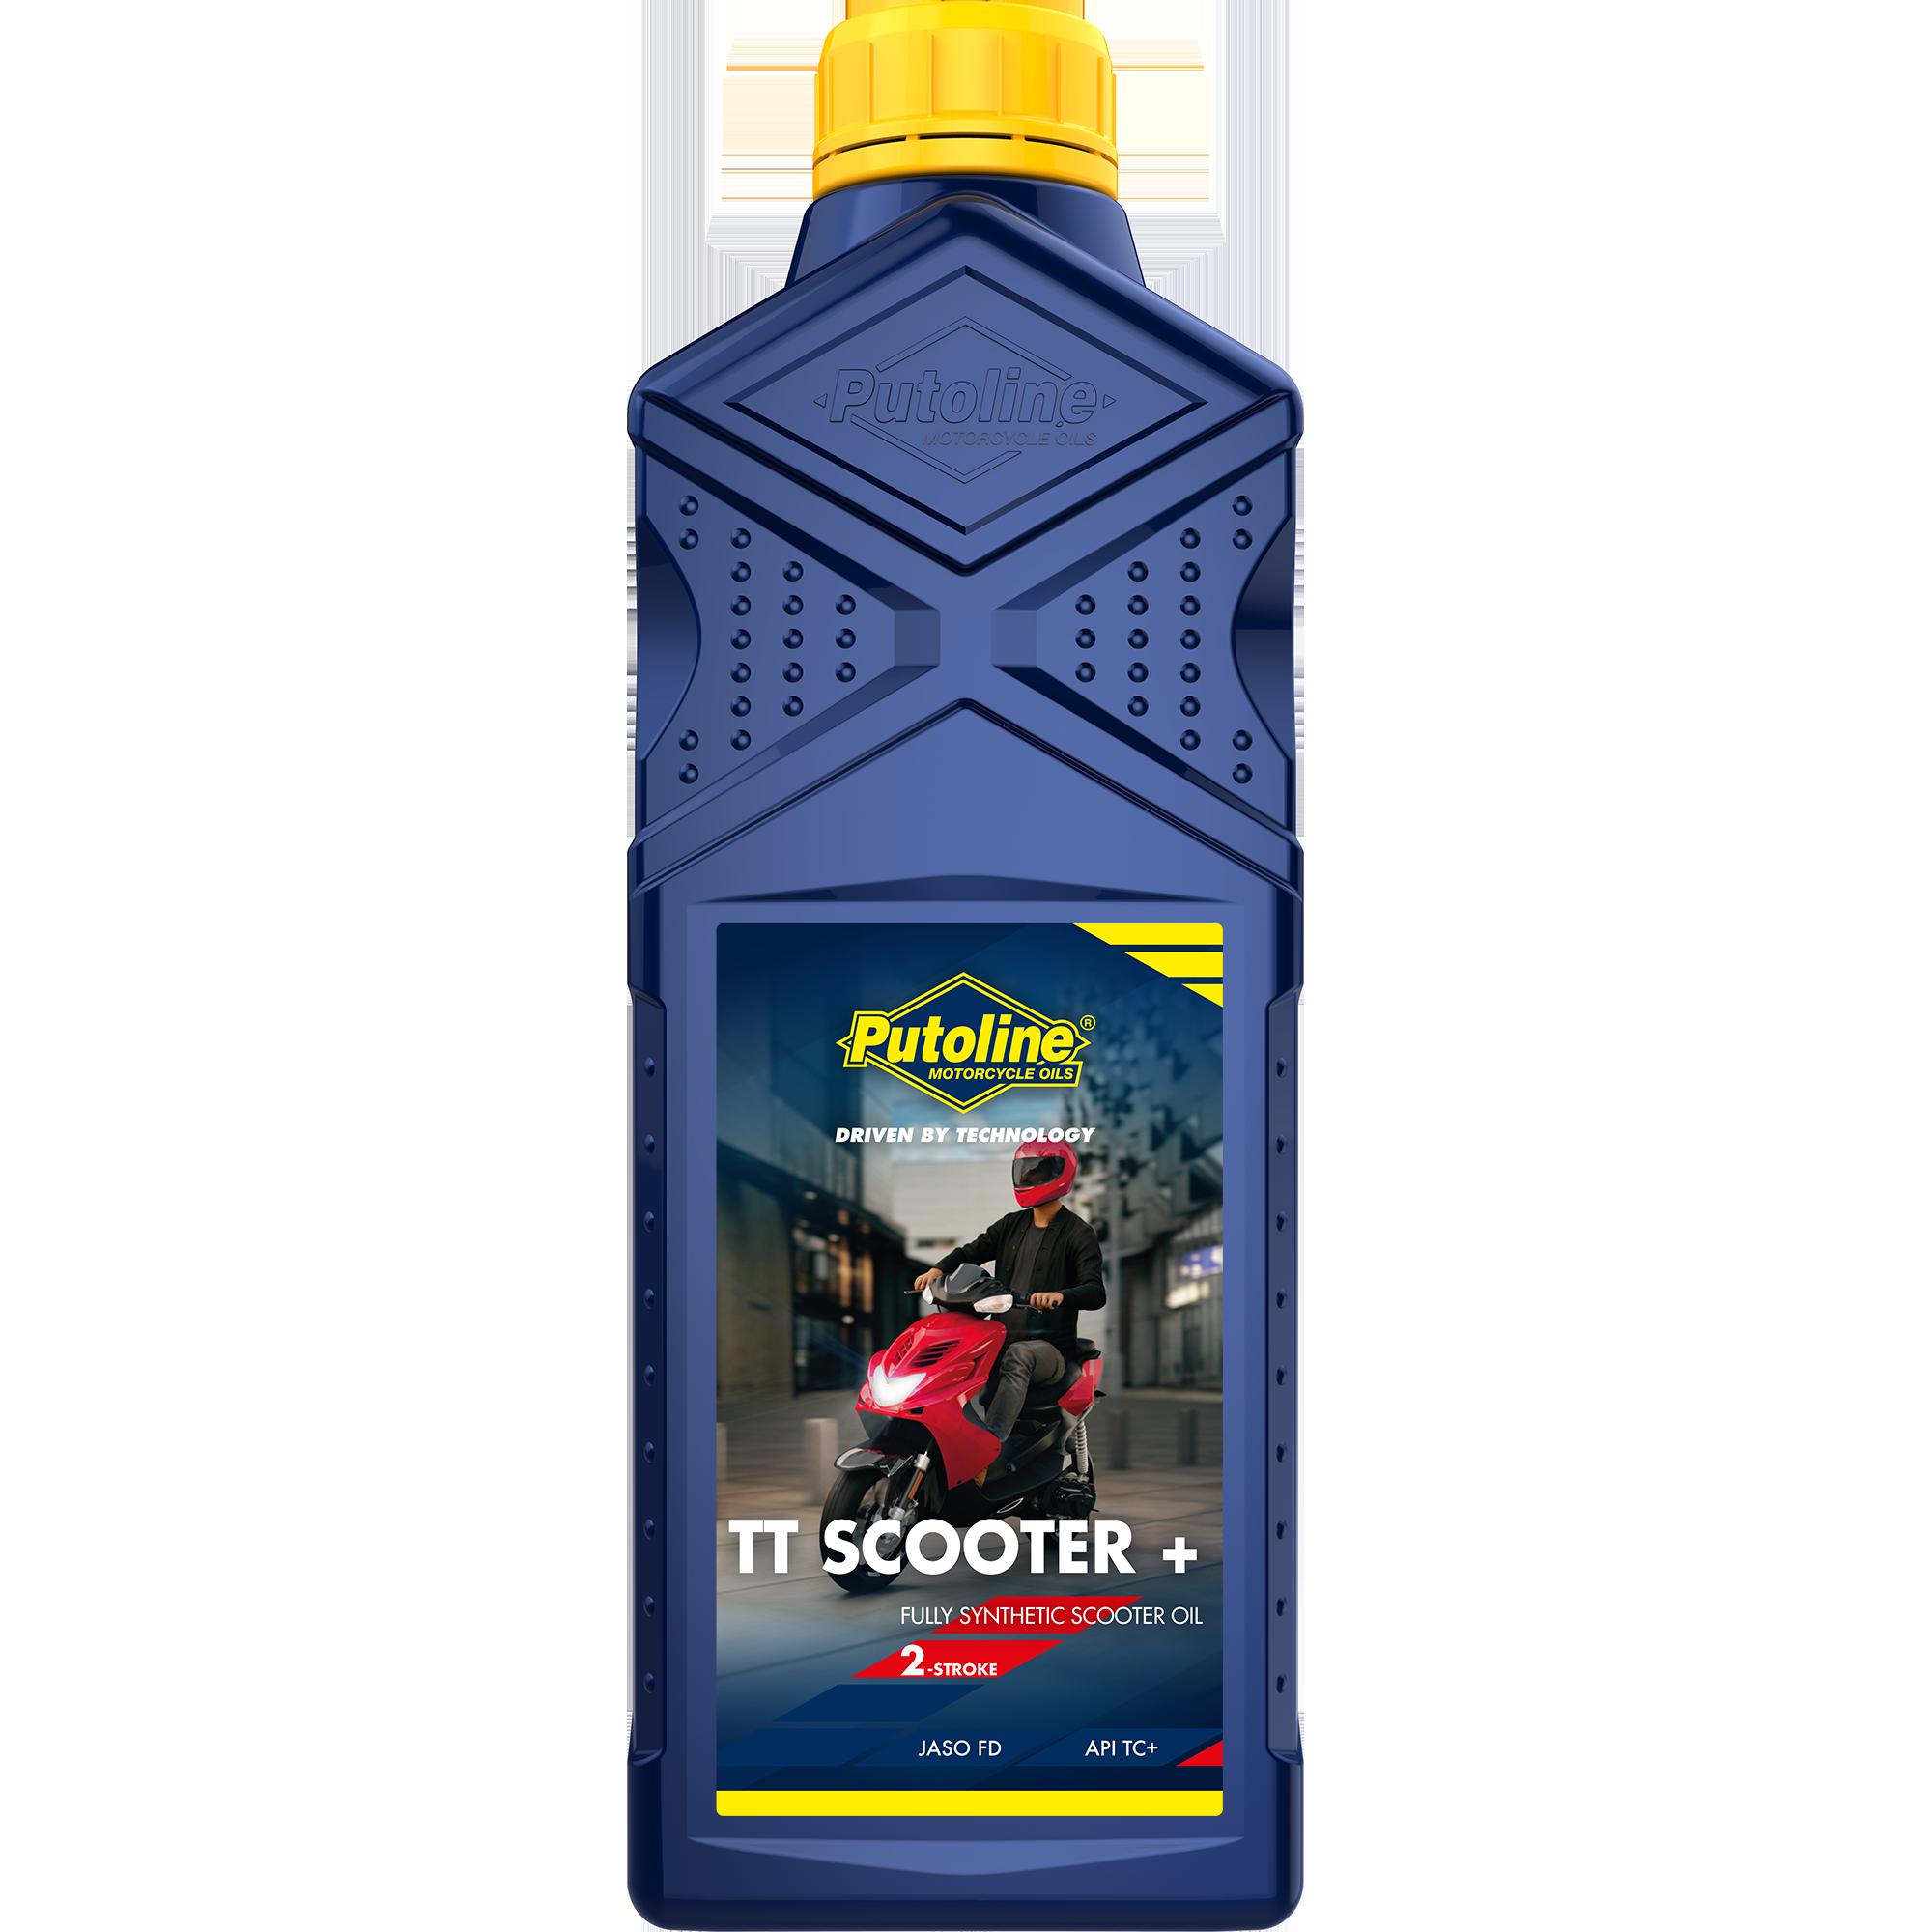 Putoline Motoröl TT Scooter+ 1L